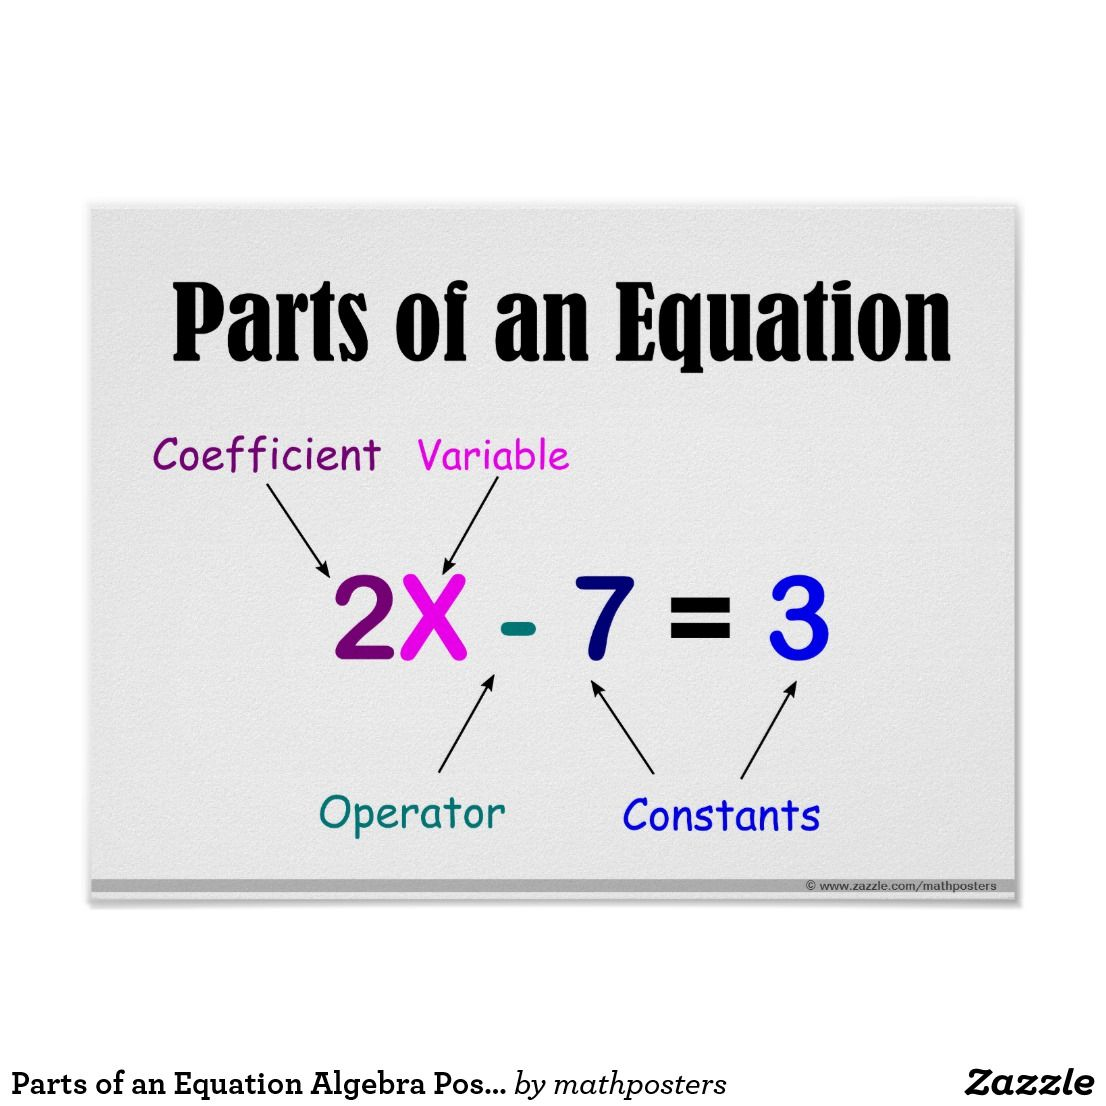 Parts Of An Equation Algebra Poster Zazzle Com Algebra Flashcards Math Tutorials Math Classroom Posters Addition of algebraic expressions